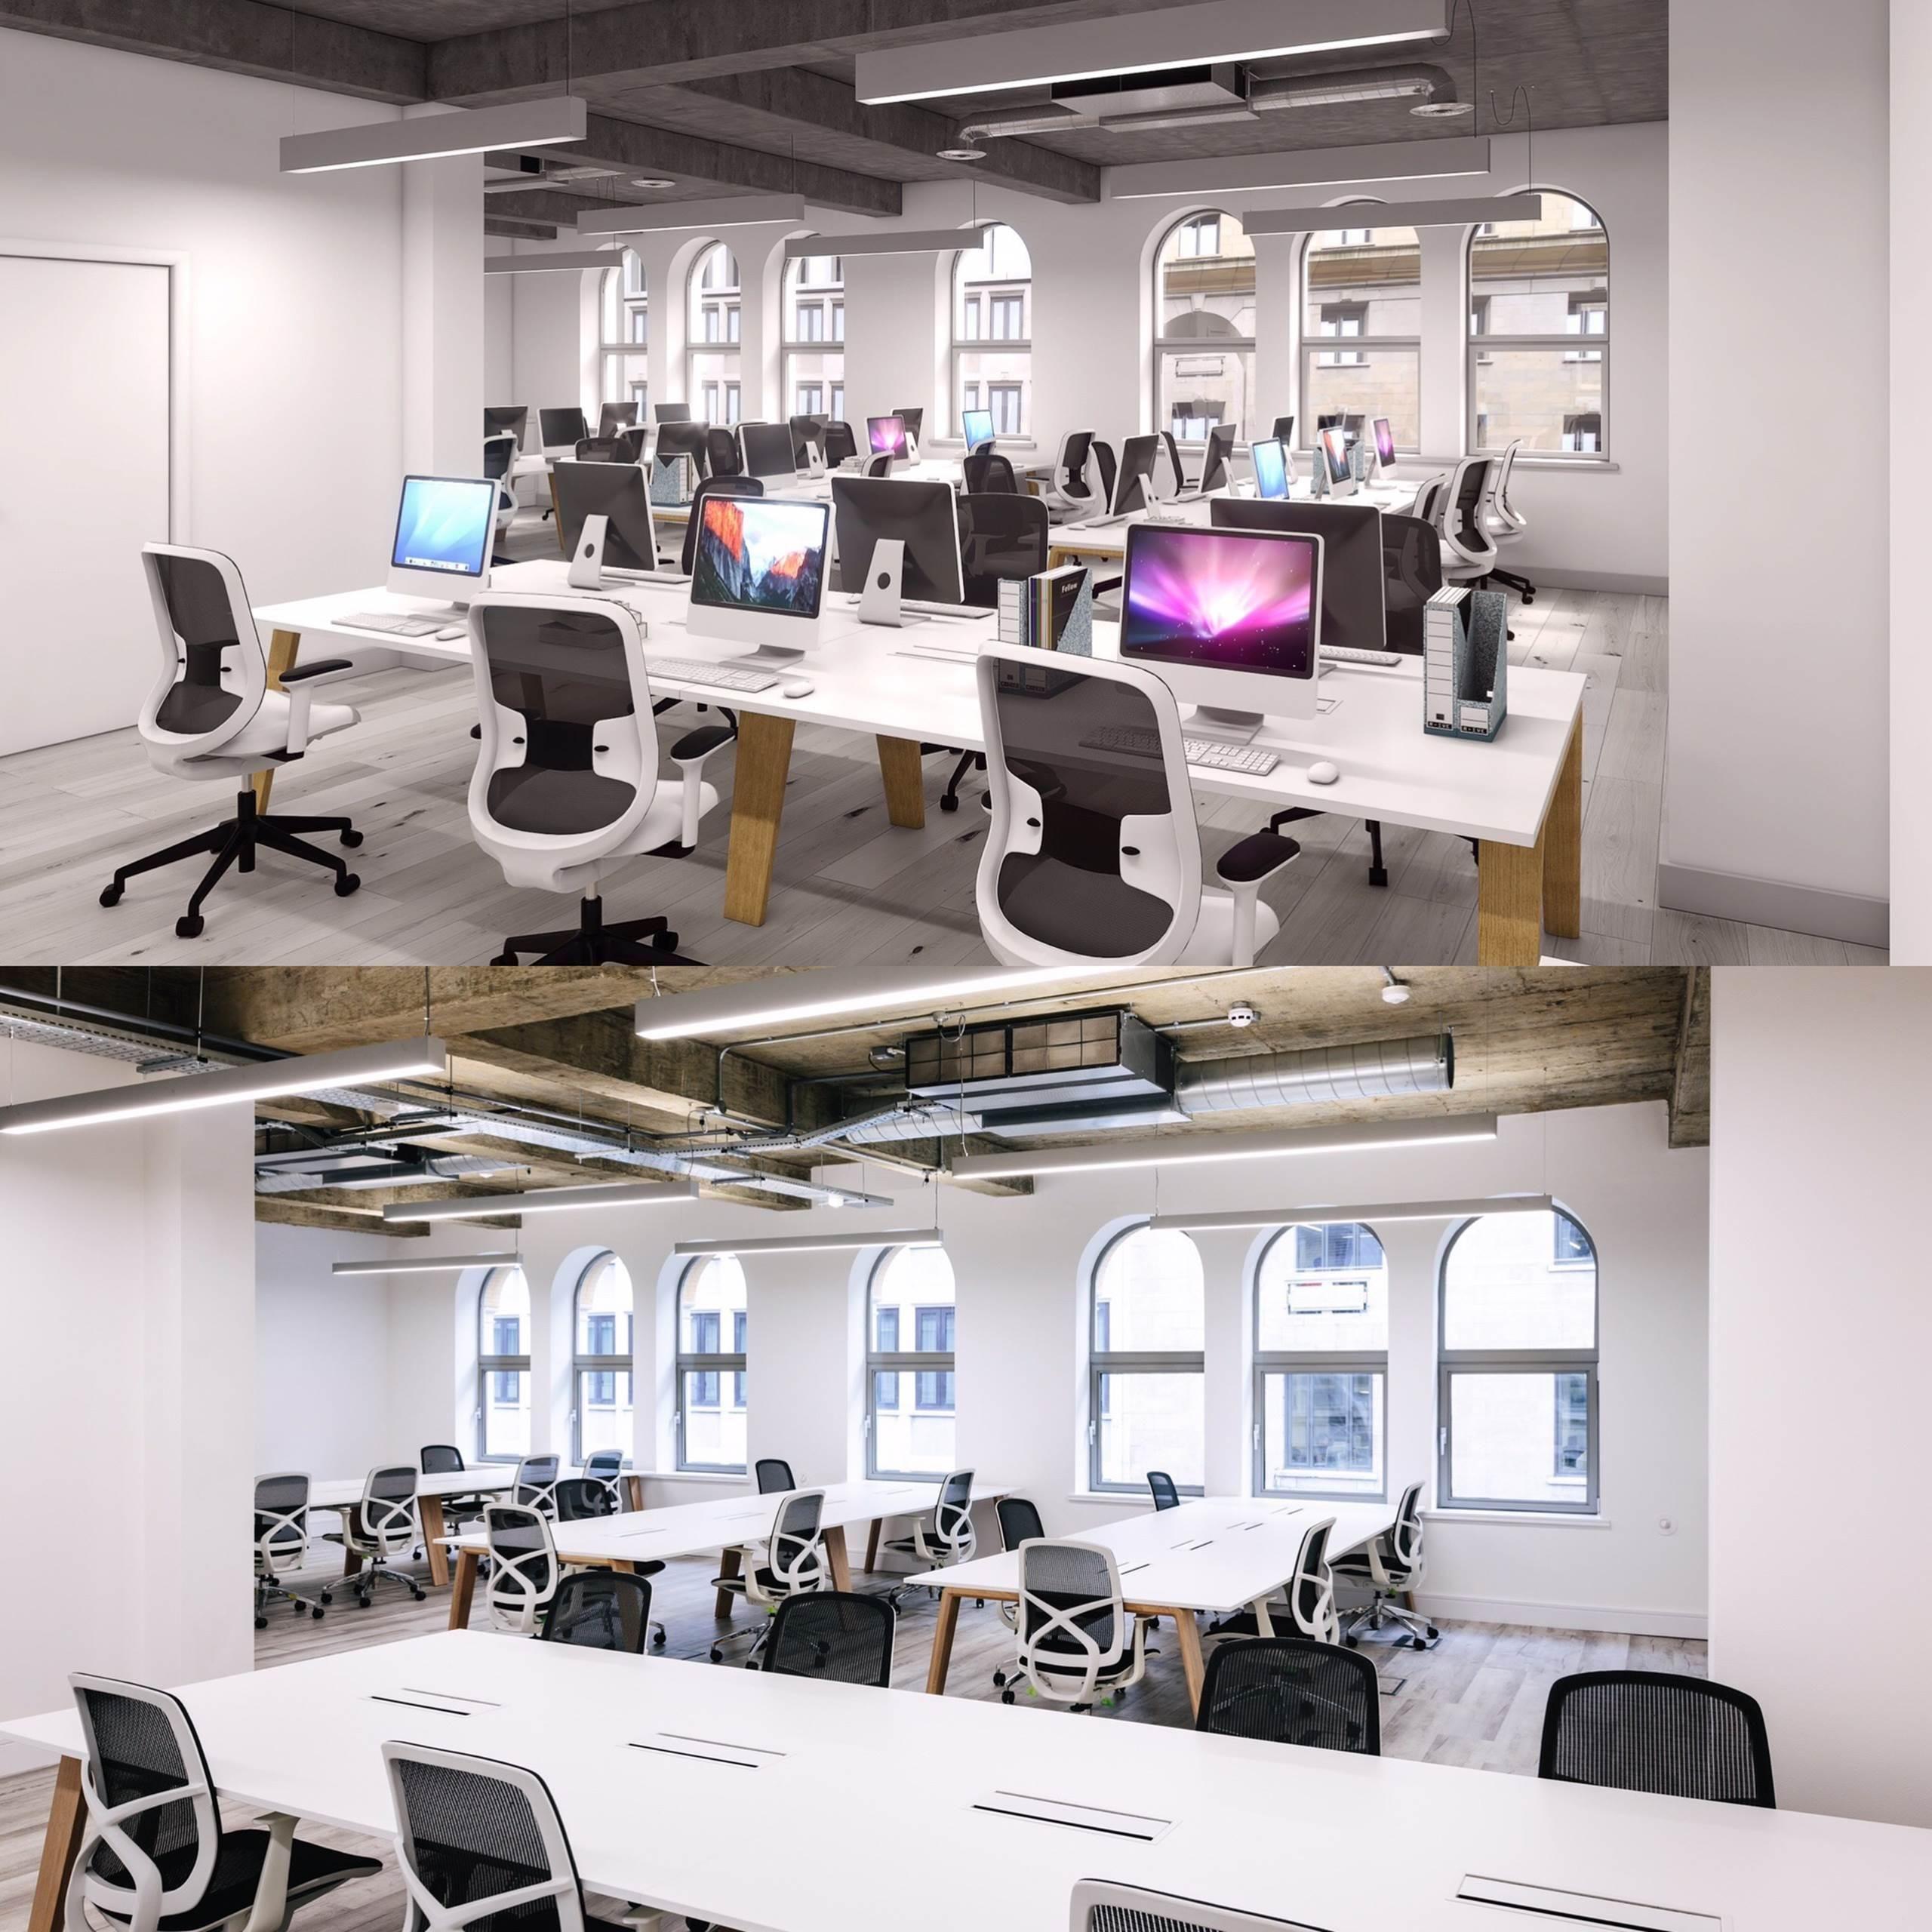 Interior Design Vs Architecture Reddit: Interior CGI (Summer 2016) Vs Finished Project (December